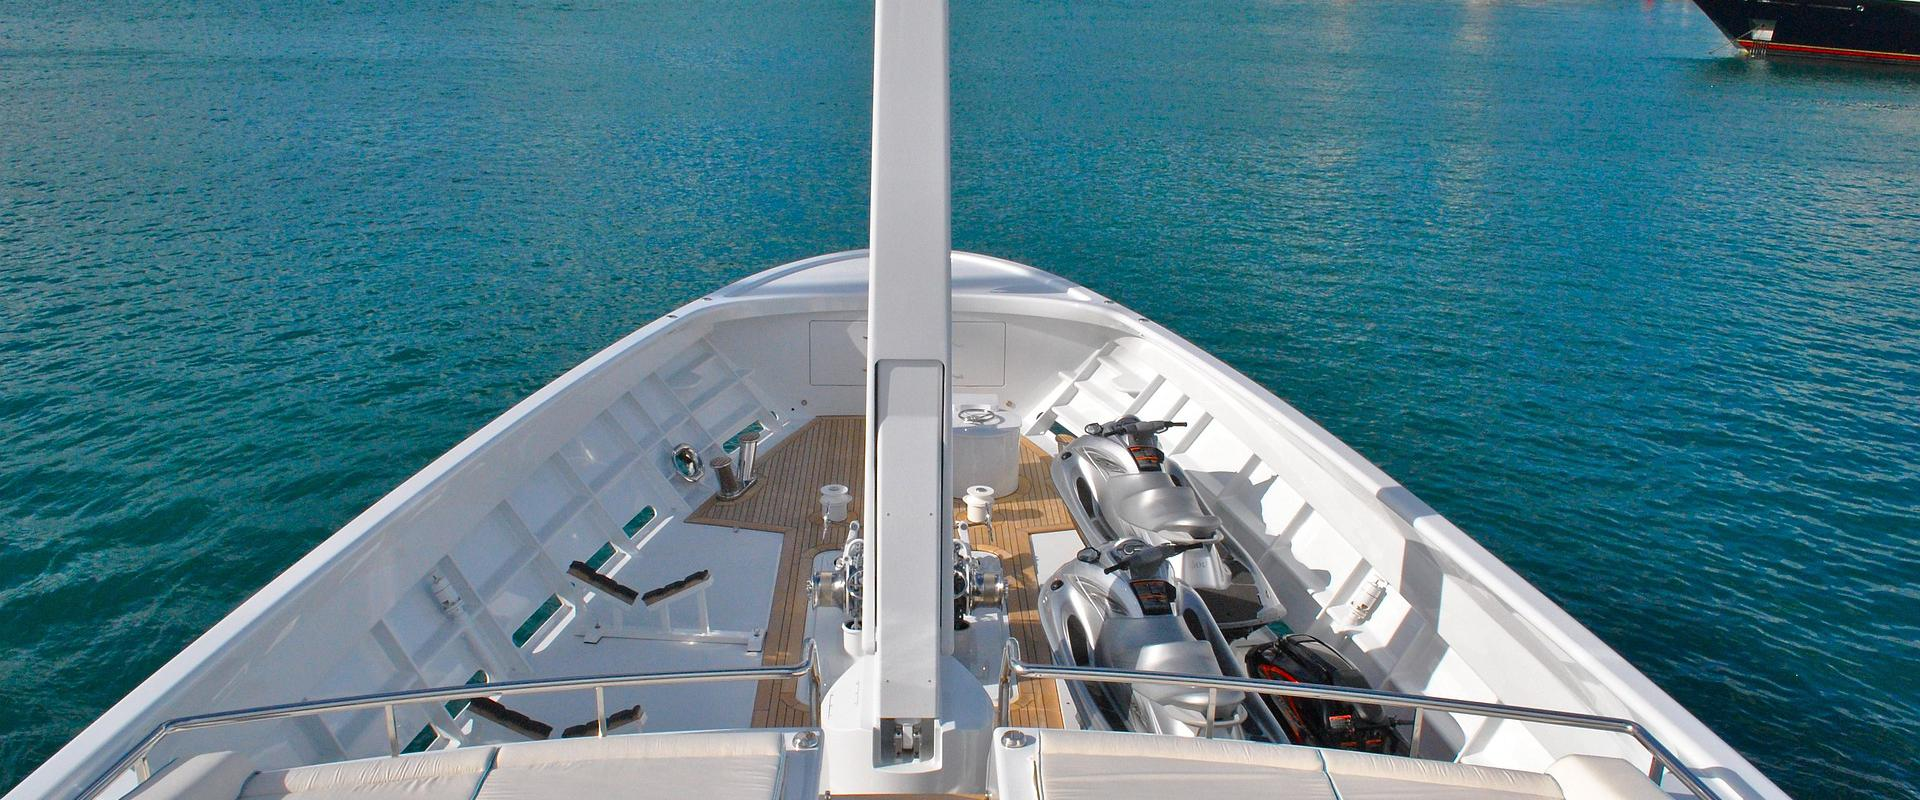 Yacht Design, ecco i trend 2018-itok=k2PD2RHg.jpg